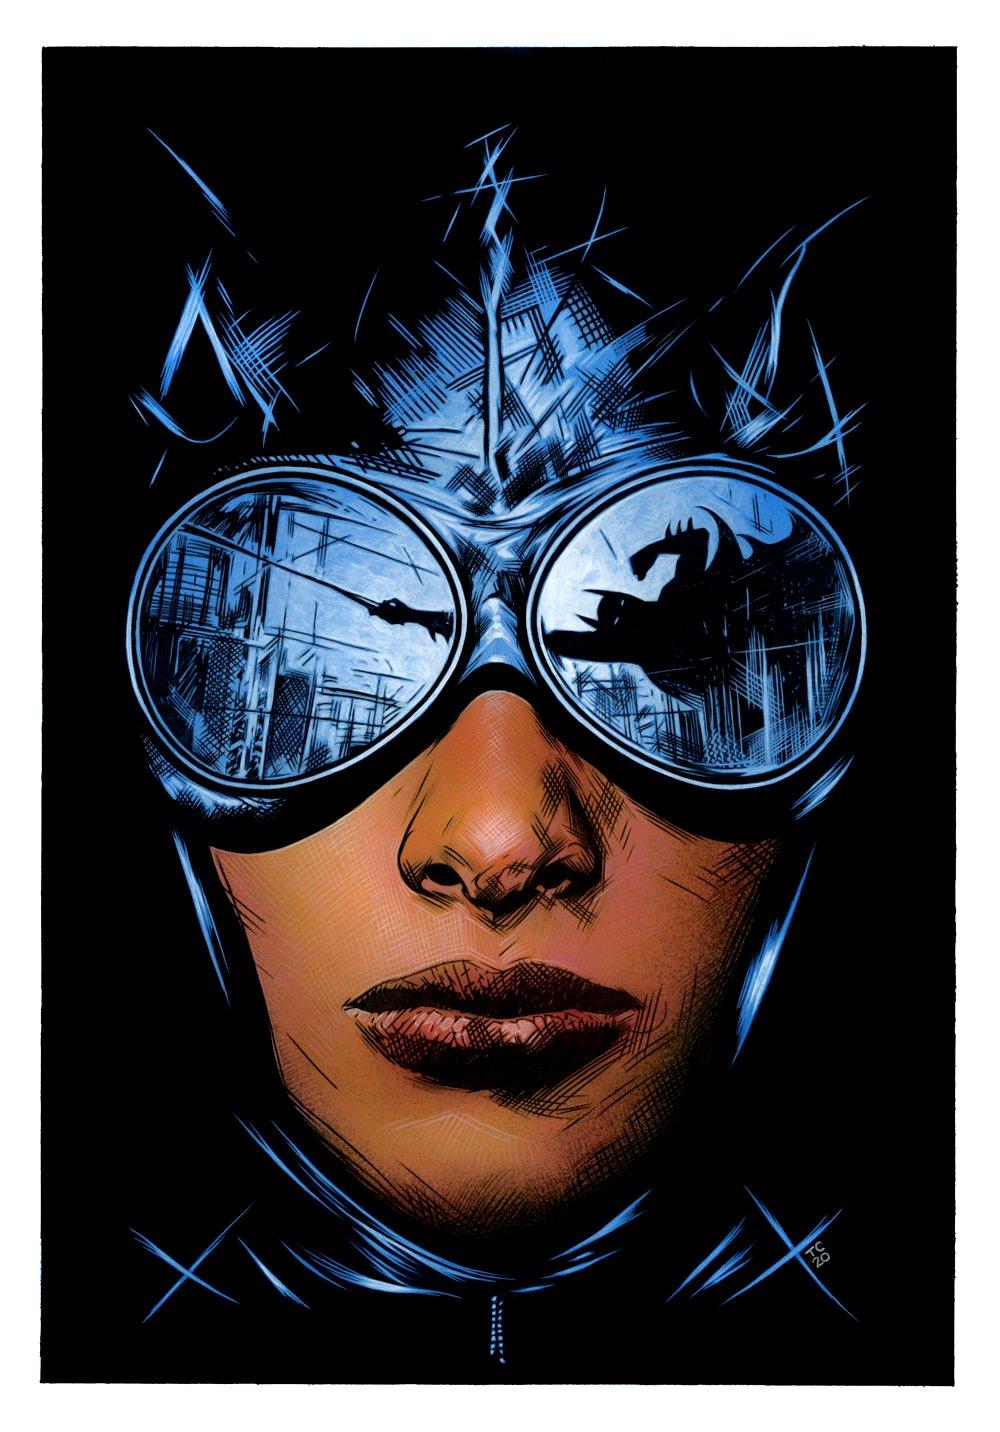 Batman / Catwoman #3 Cover Painting (Large Art) 2020